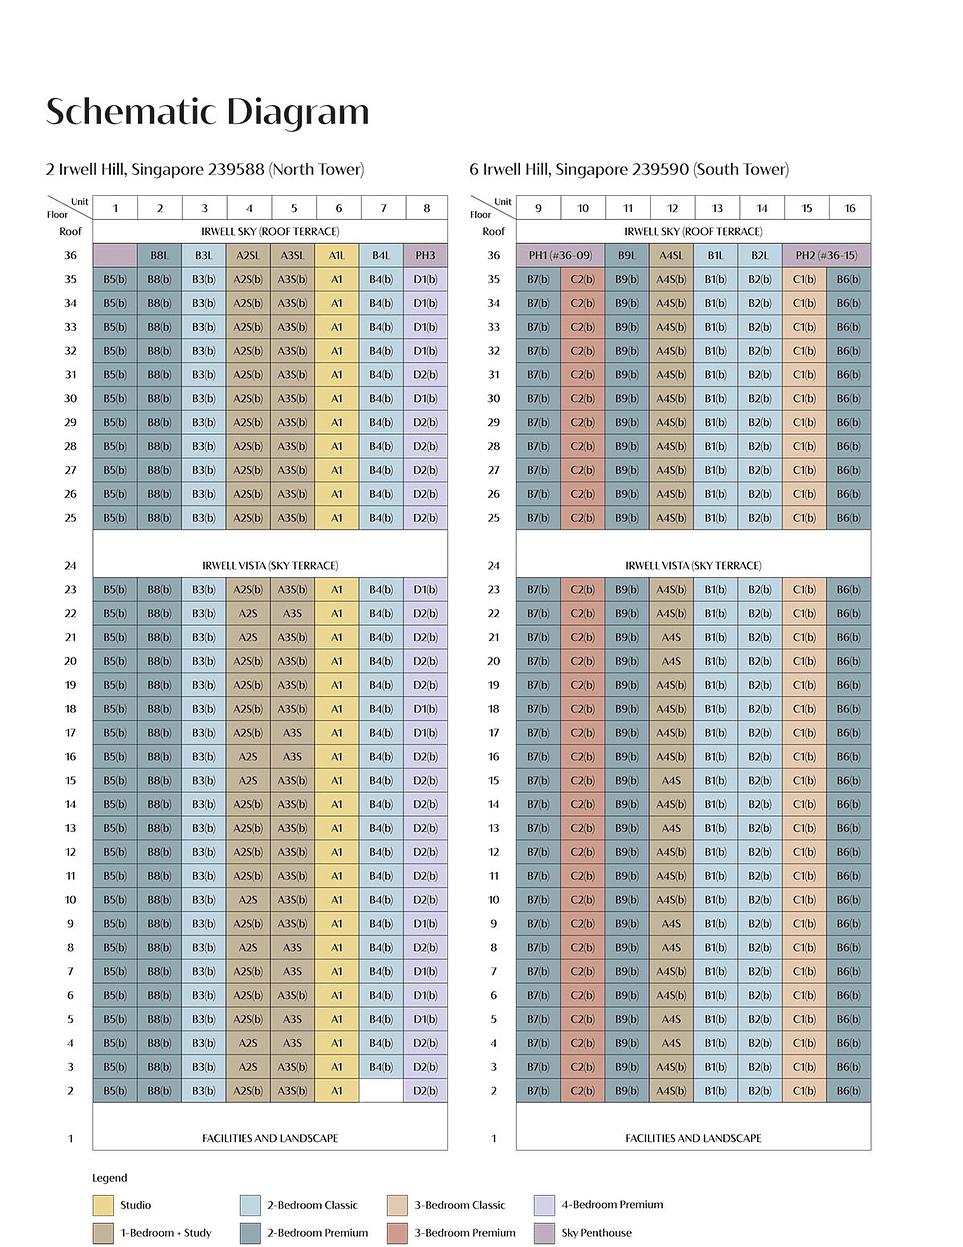 Irwell Hill Residences Elevation Chart